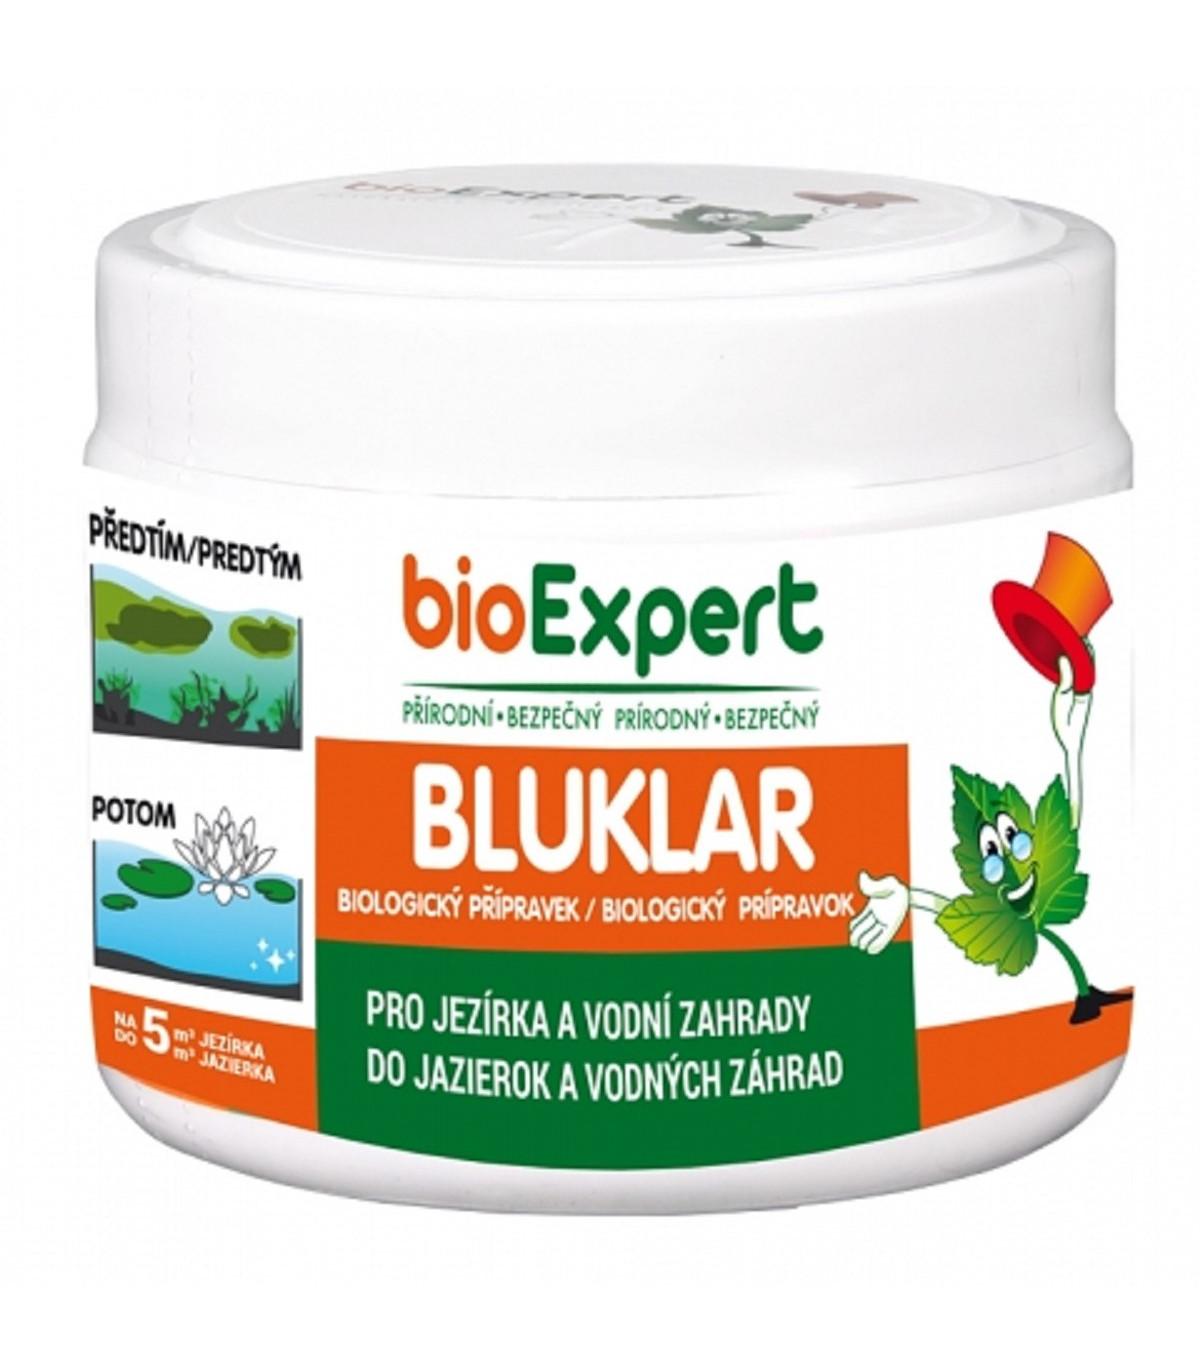 BioExpert do jezírek - 250 g - 1 ks